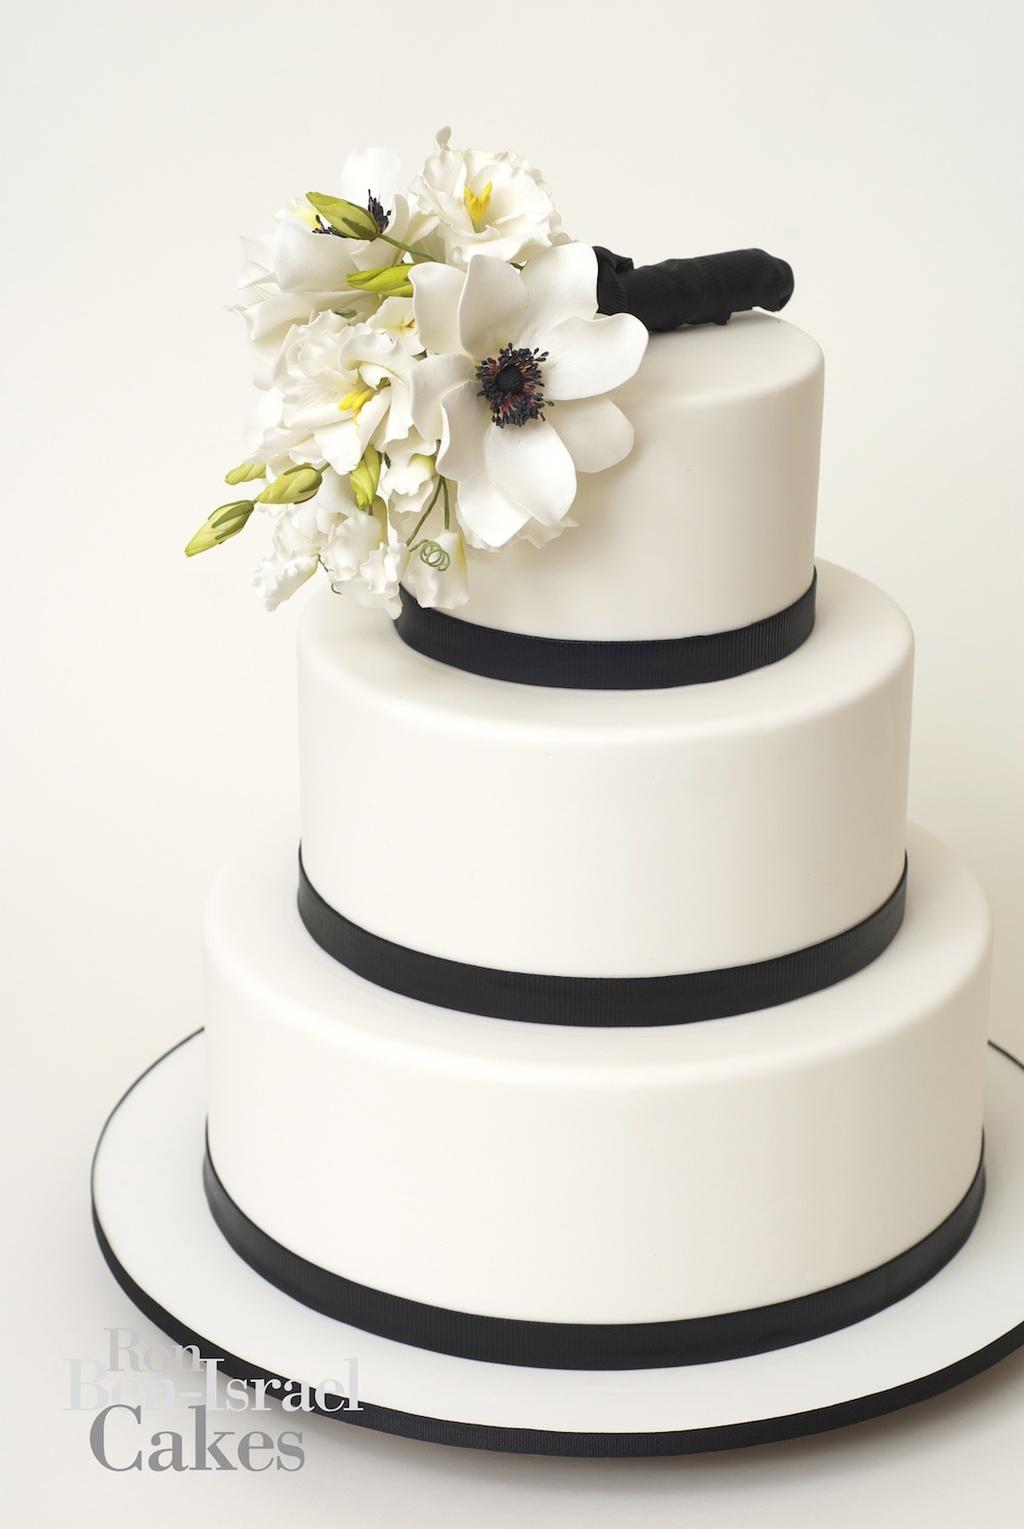 Wedding-cake-inspiration-ron-ben-isreal-wedding-cakes-white-black-classic.original.full